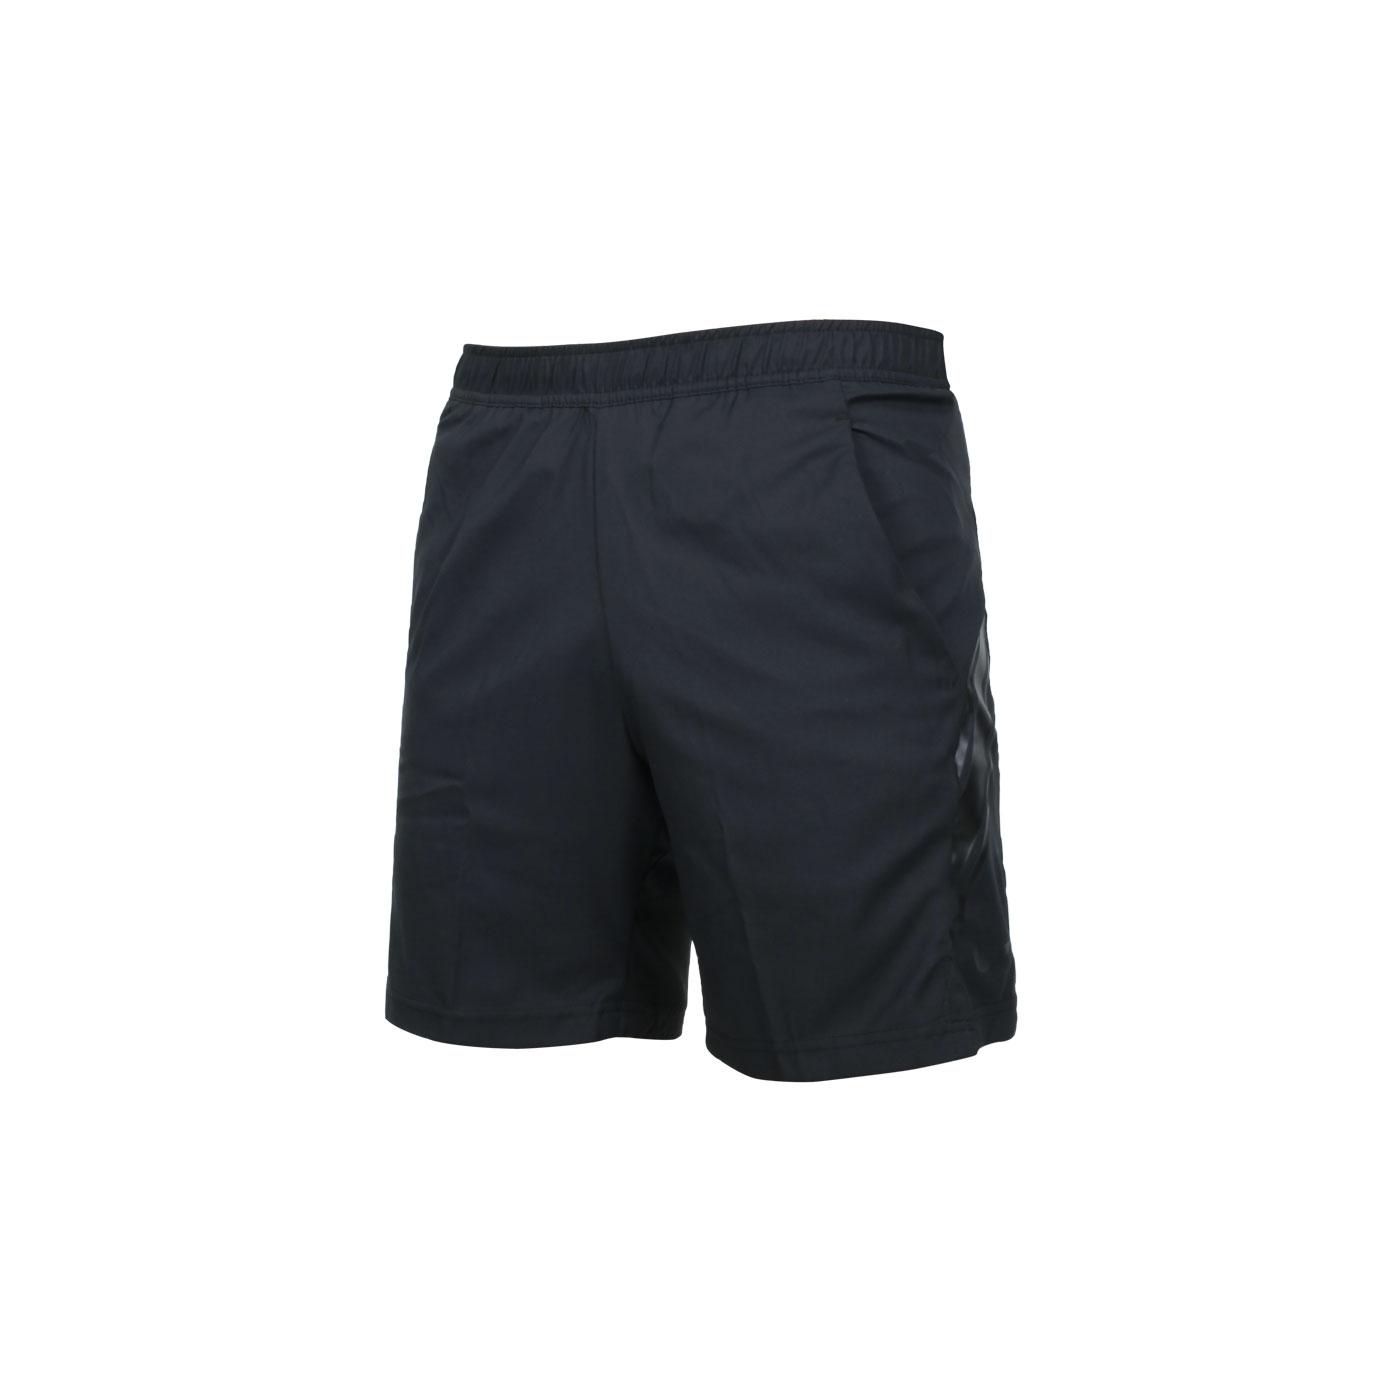 NIKE 男款運動短褲 939266-010 - 黑